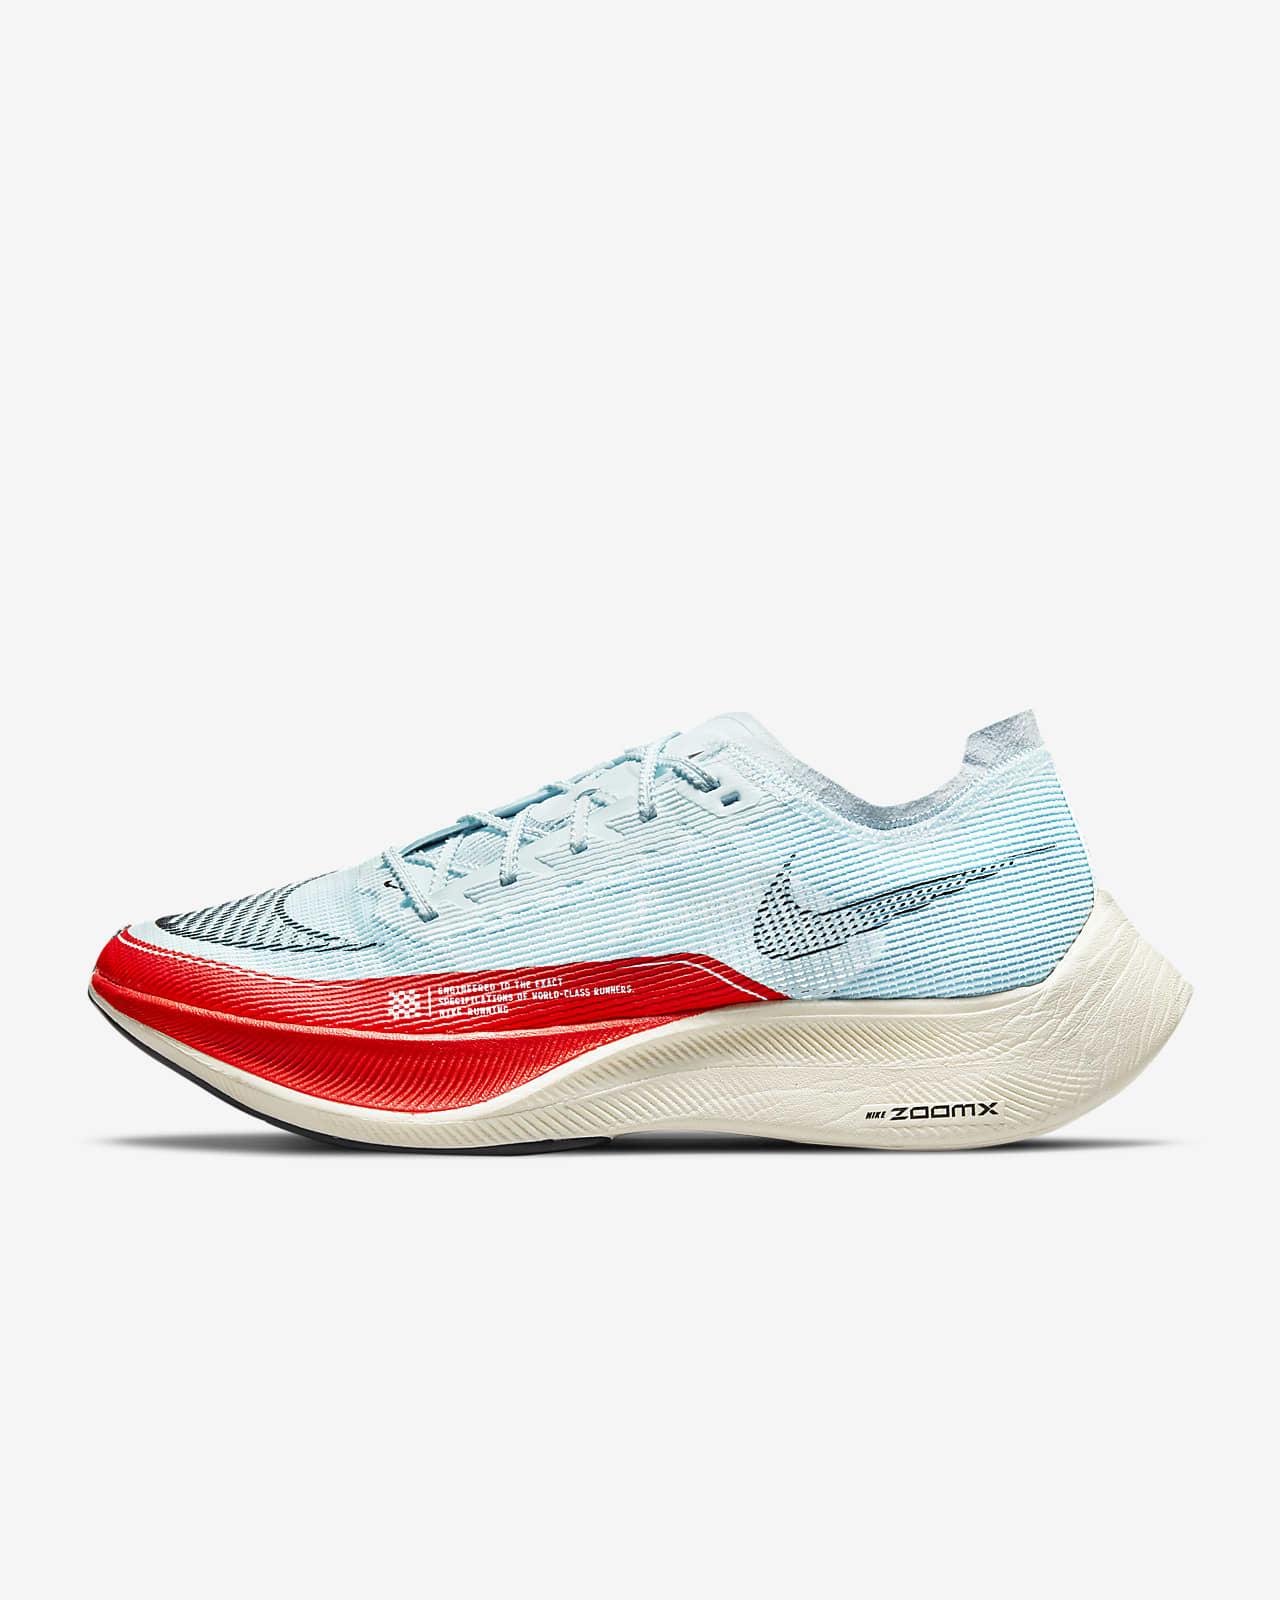 Nike ZoomX Vaporfly Next% 2 'OG' Men's Racing Shoes